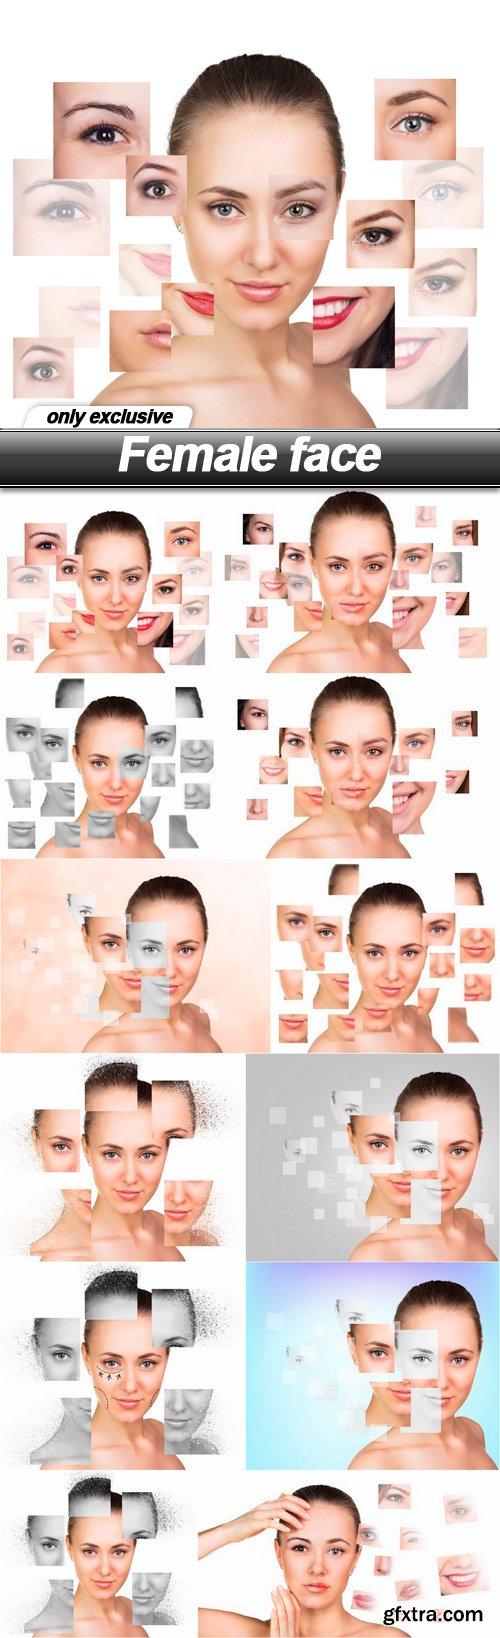 Female face - 12 UHQ JPEG